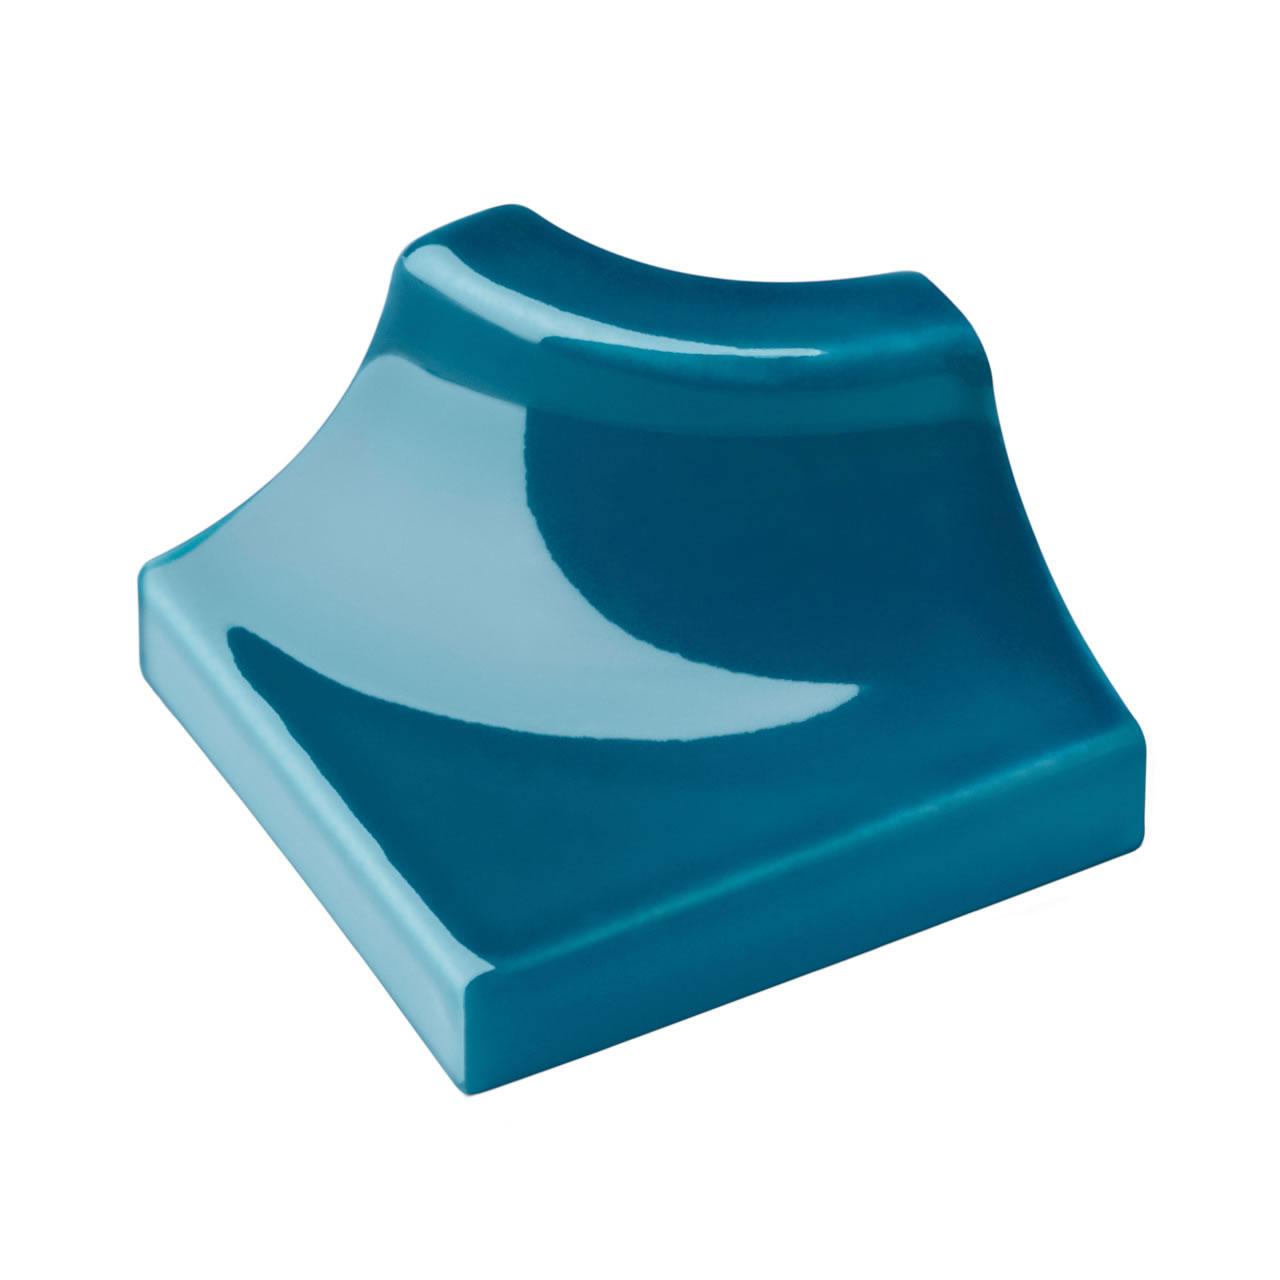 canto interno azul petroleo 2,5×2,5